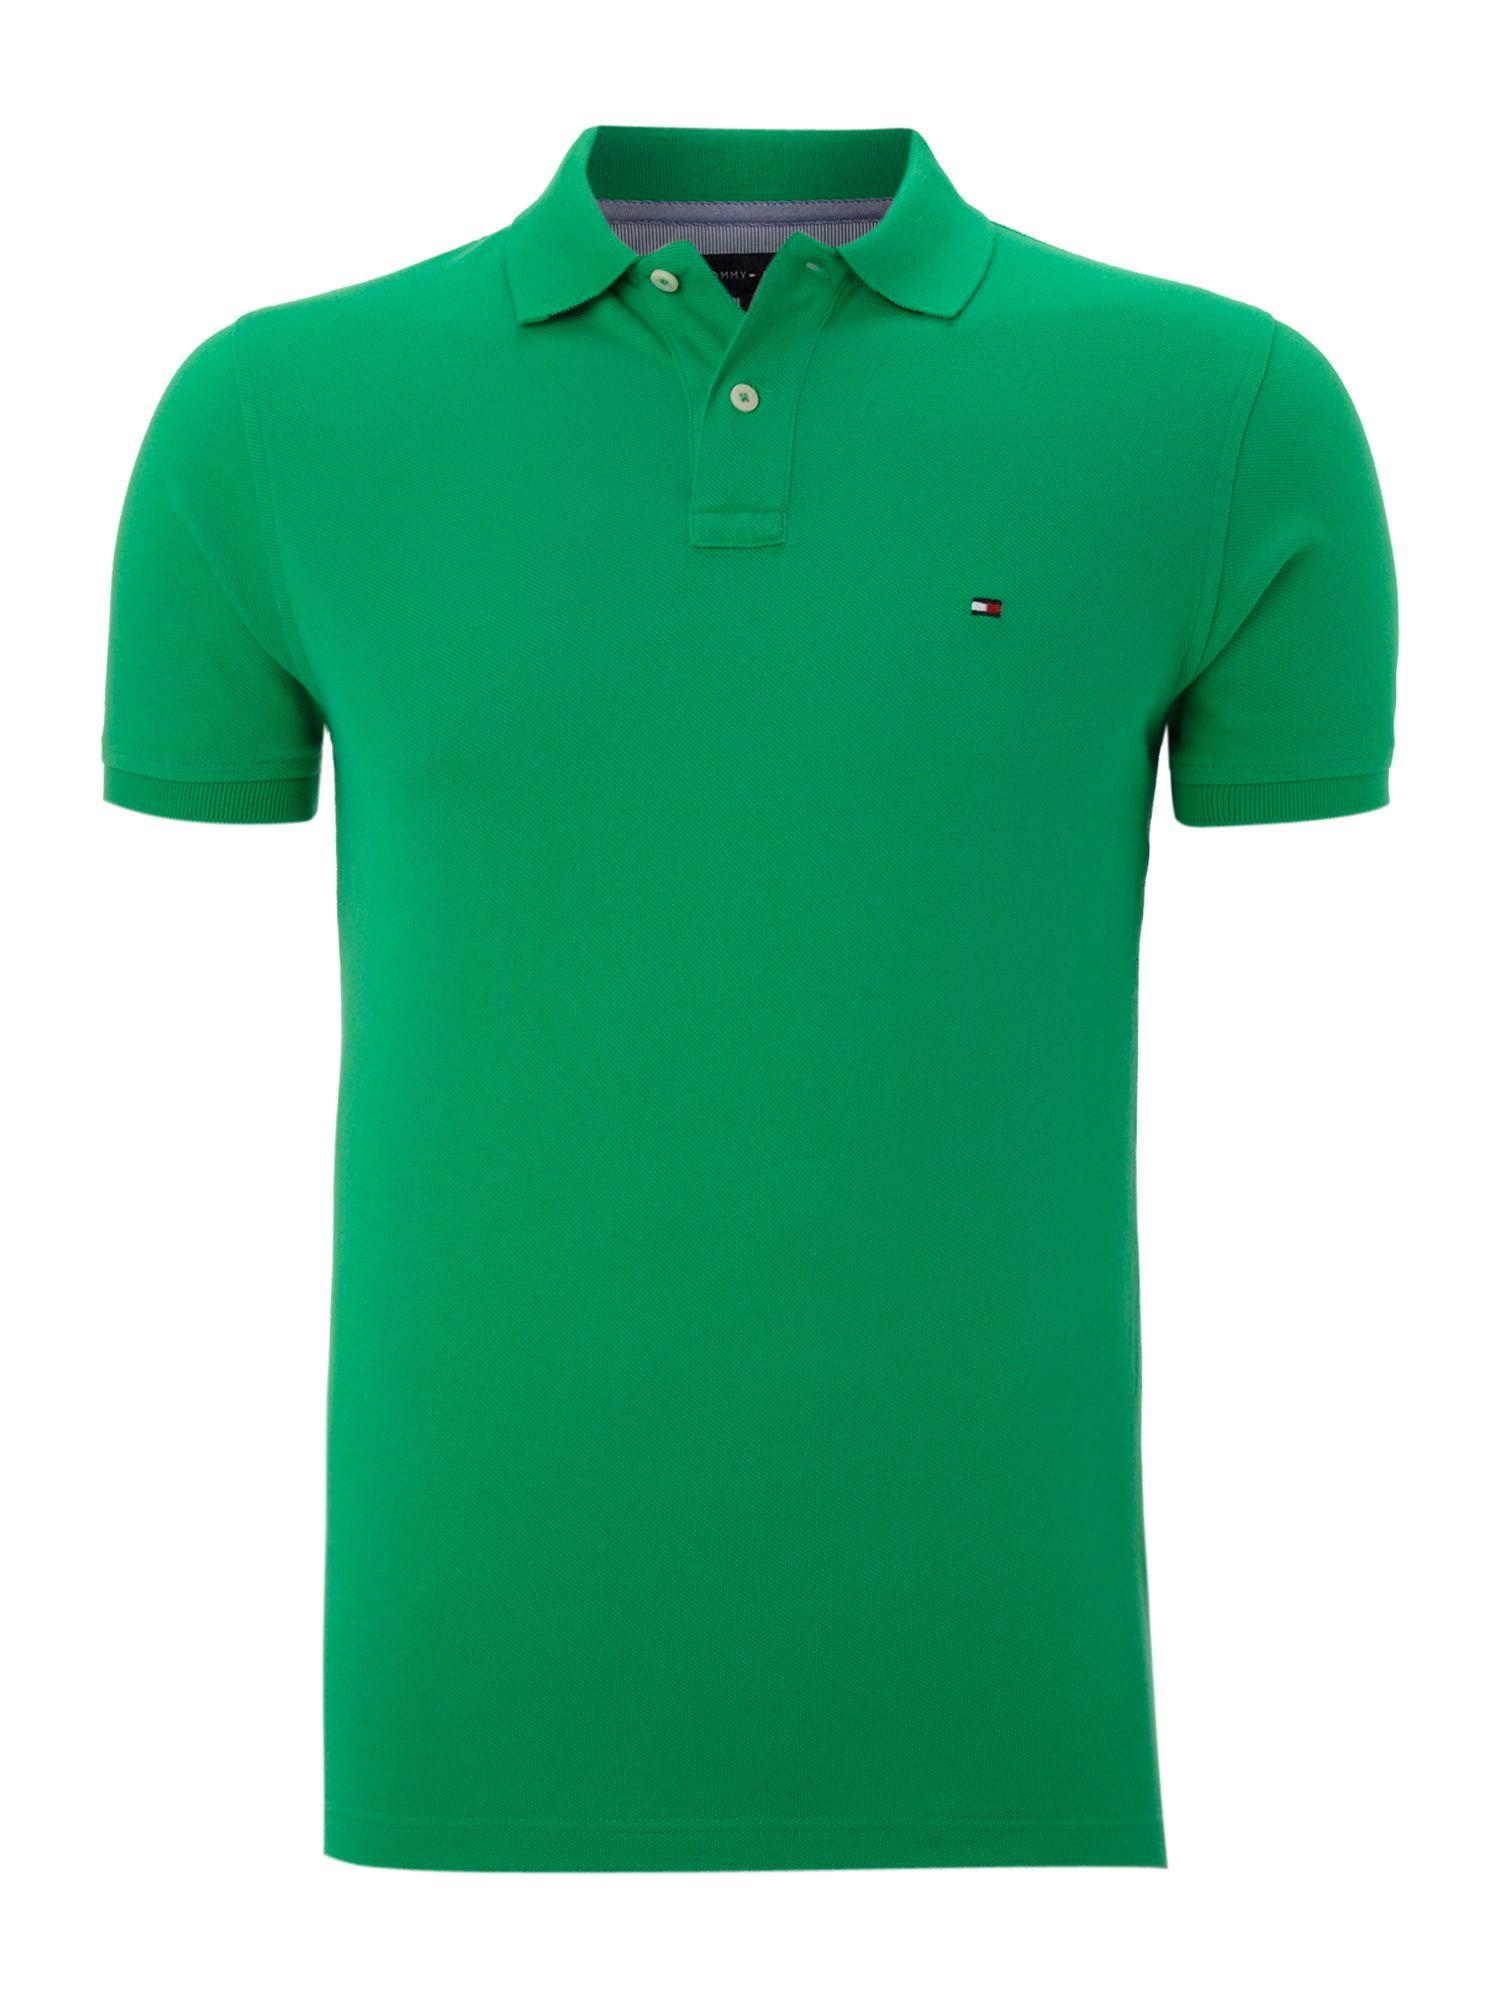 tommy hilfiger washed slim fit polo in green for men lyst. Black Bedroom Furniture Sets. Home Design Ideas